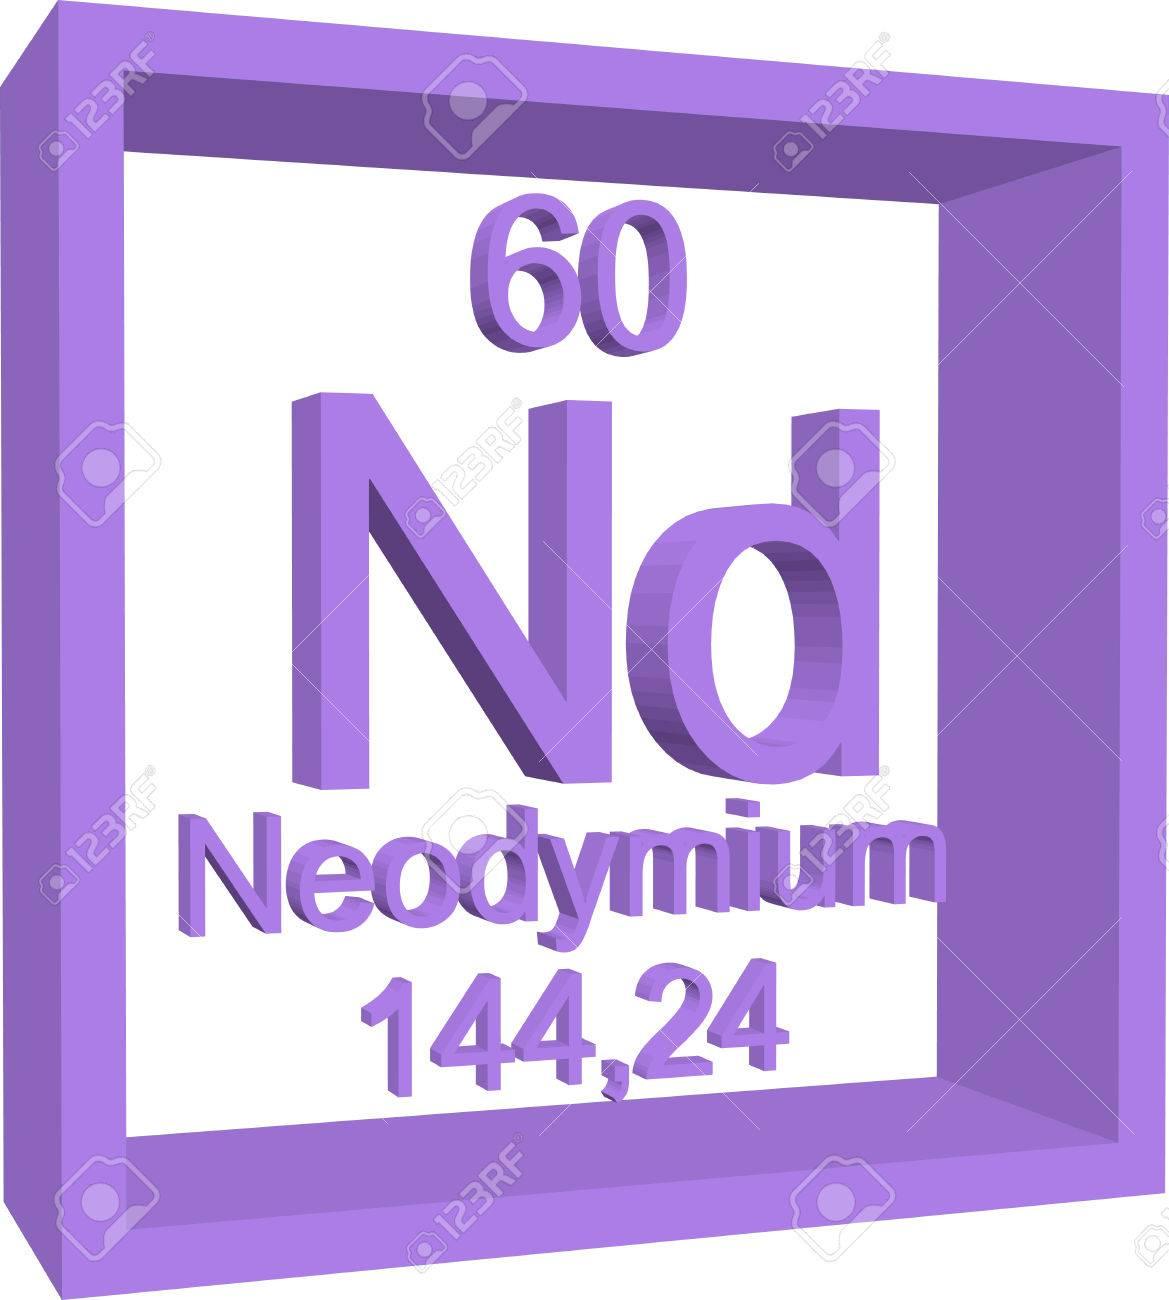 Periodic table of elements neodymium royalty free cliparts periodic table of elements neodymium stock vector 57961360 gamestrikefo Choice Image